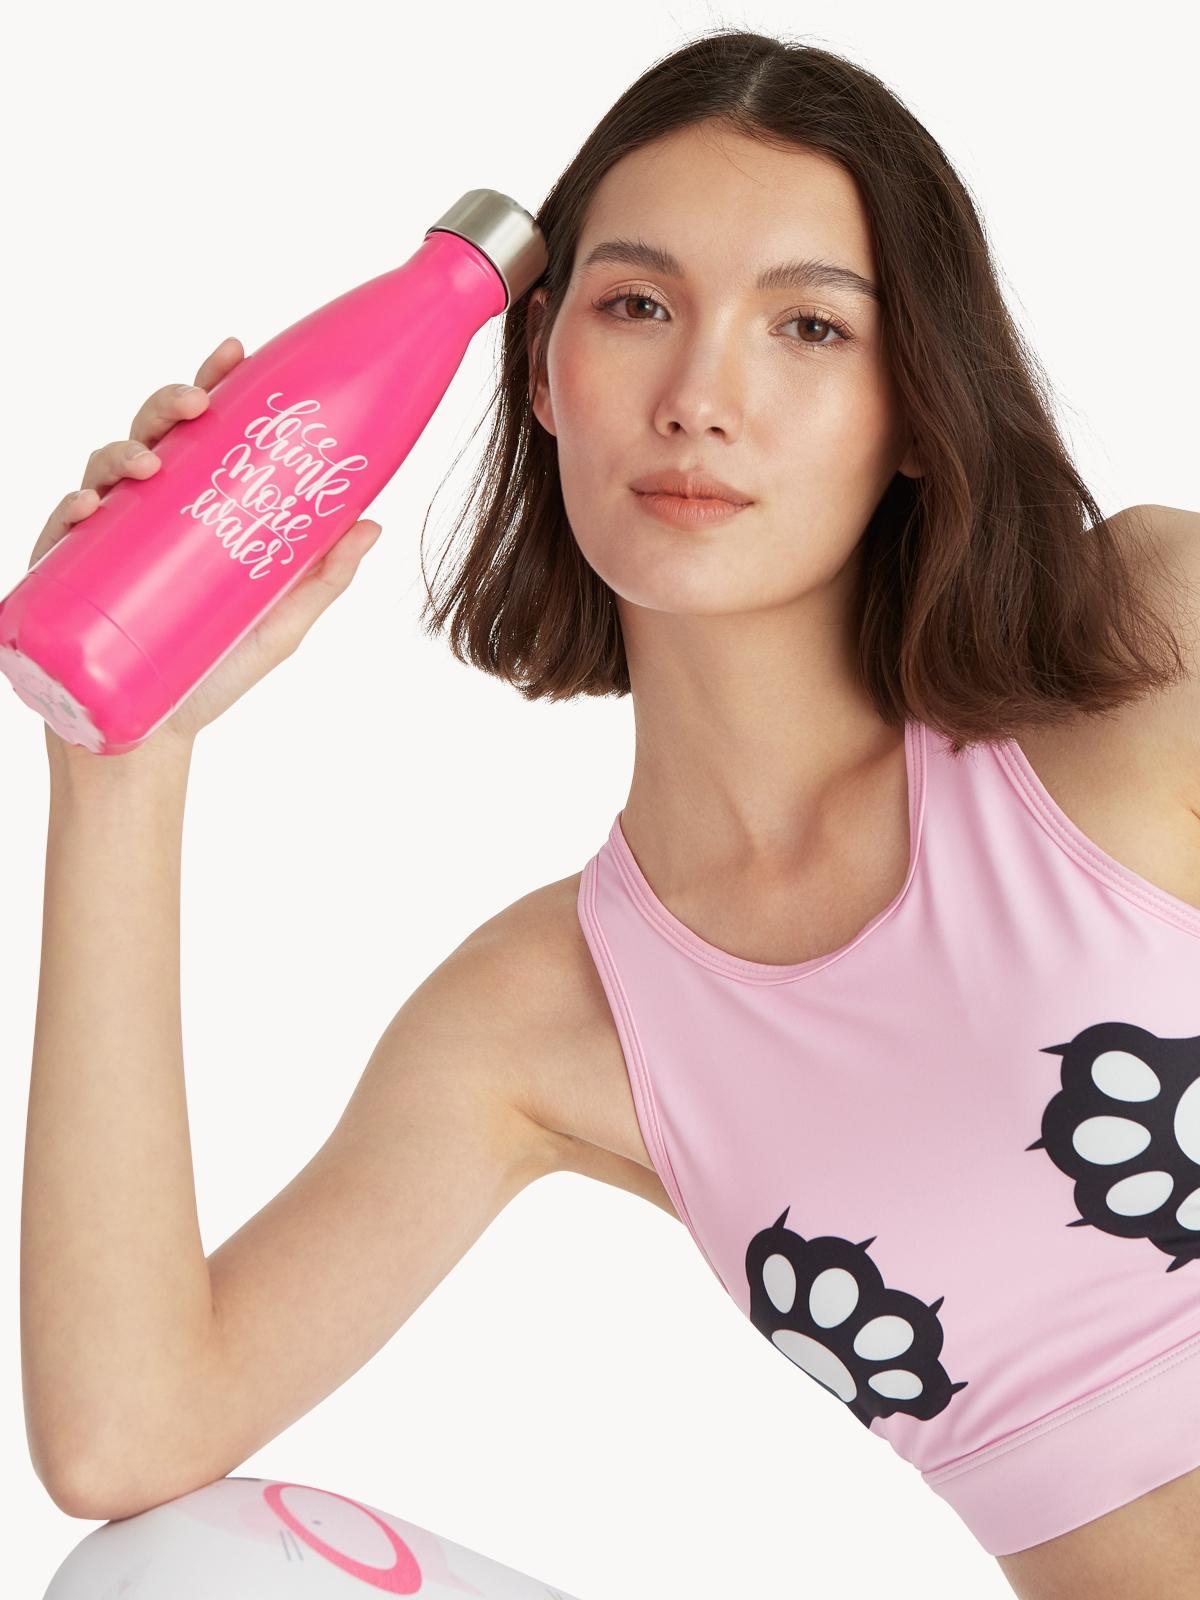 Flexi Lexi Drink More Water Tumbler Hot Pink